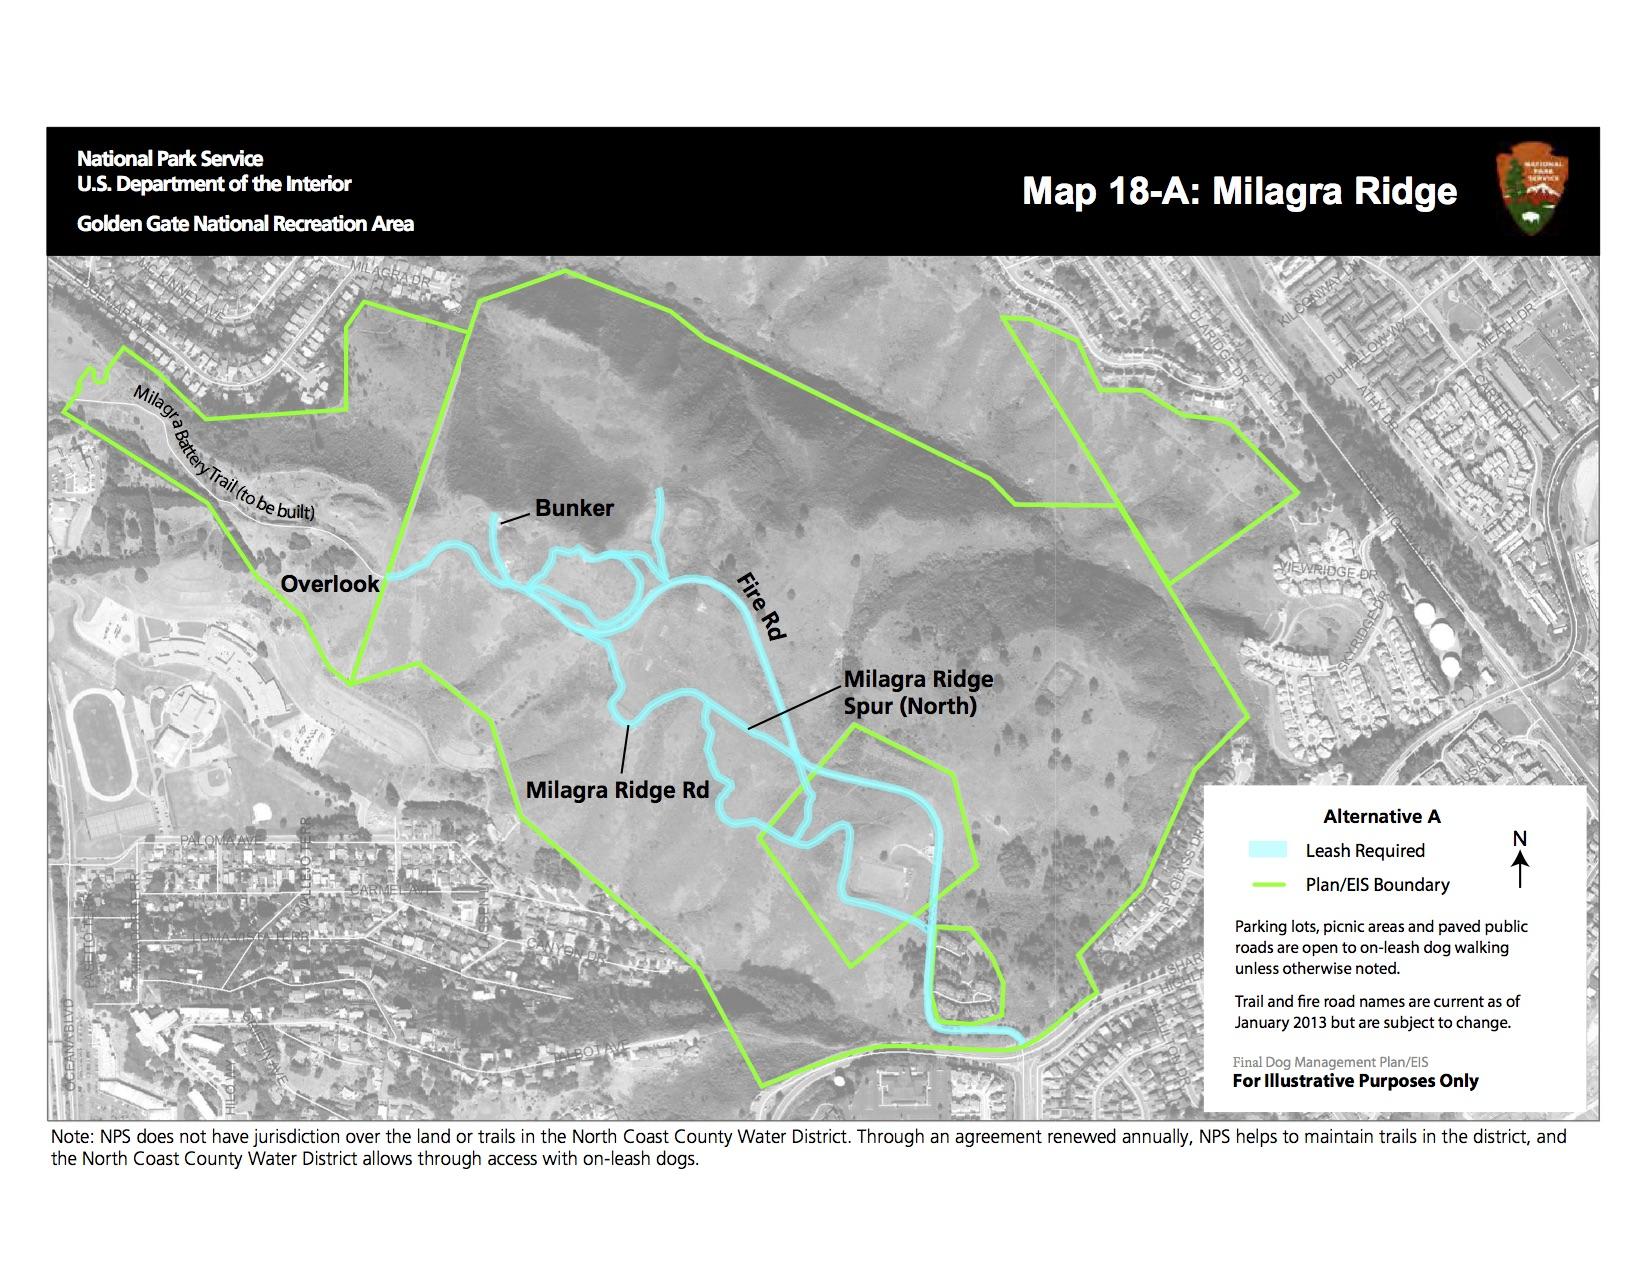 MILAGRA RIDGE - CURRENT DOG WALKING ACCESS